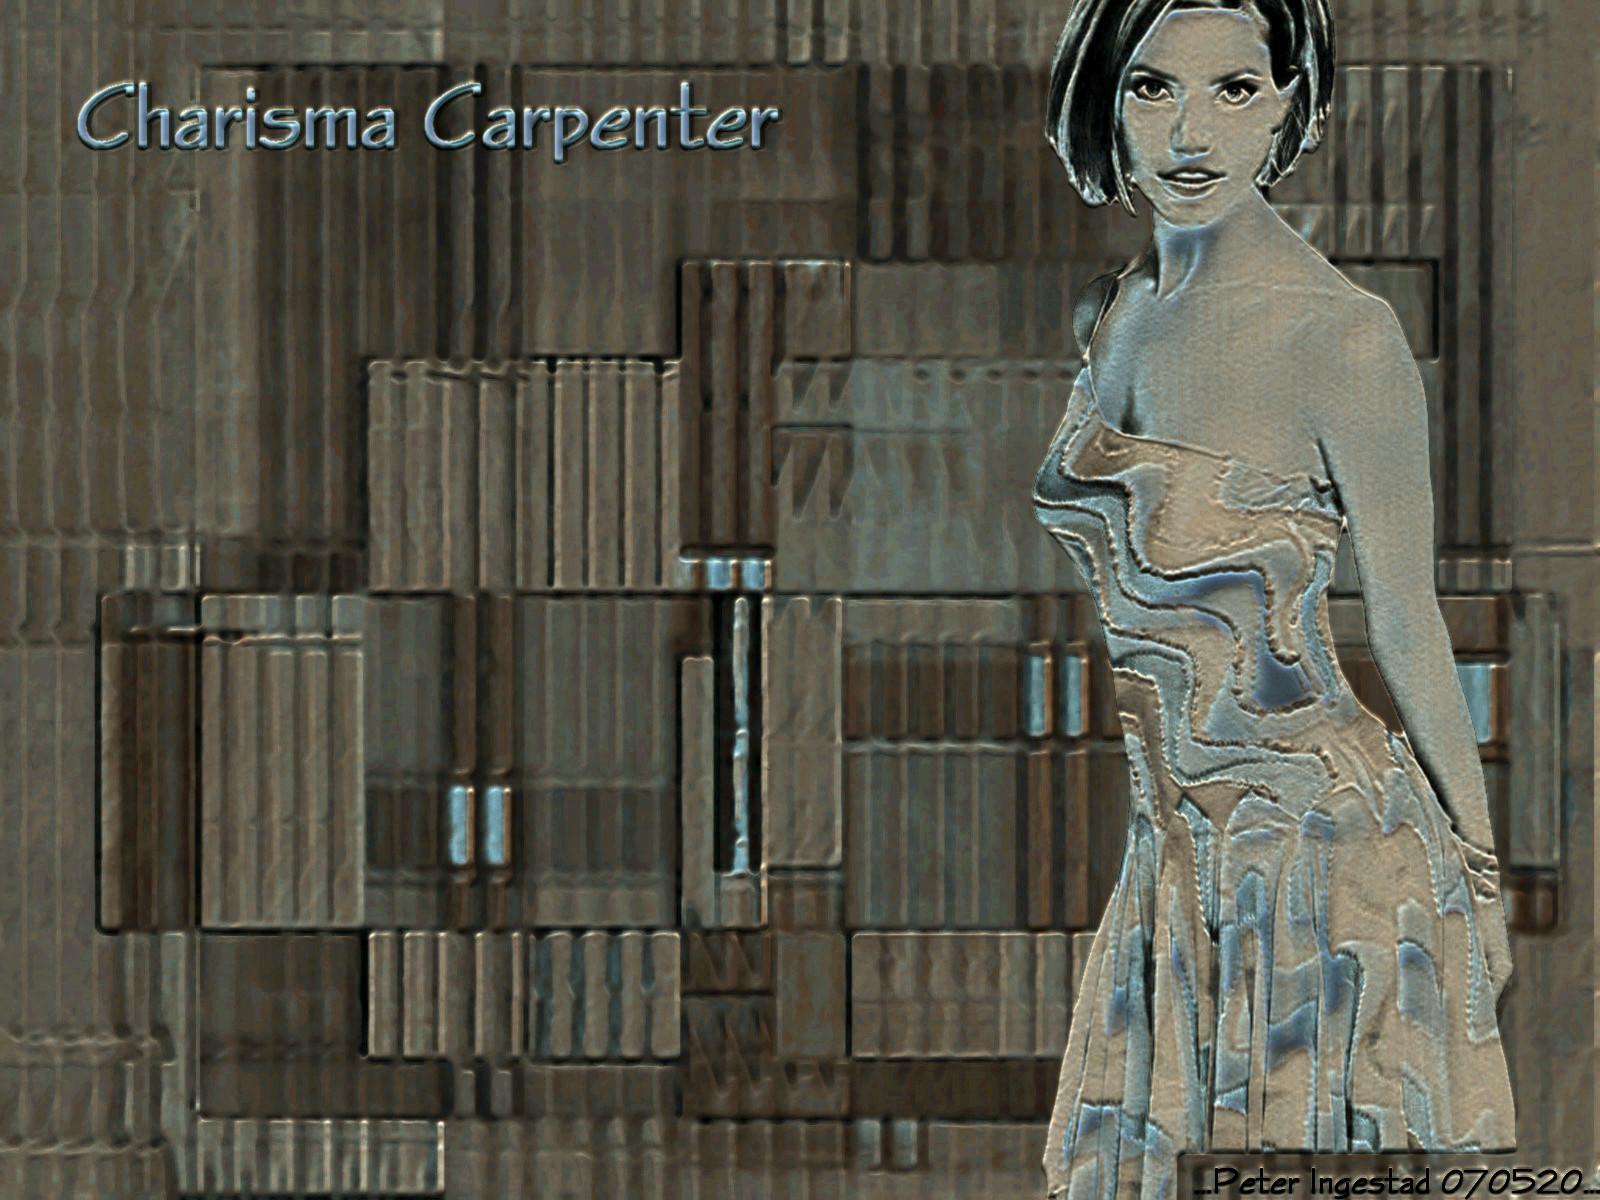 Charisma carpenter 6